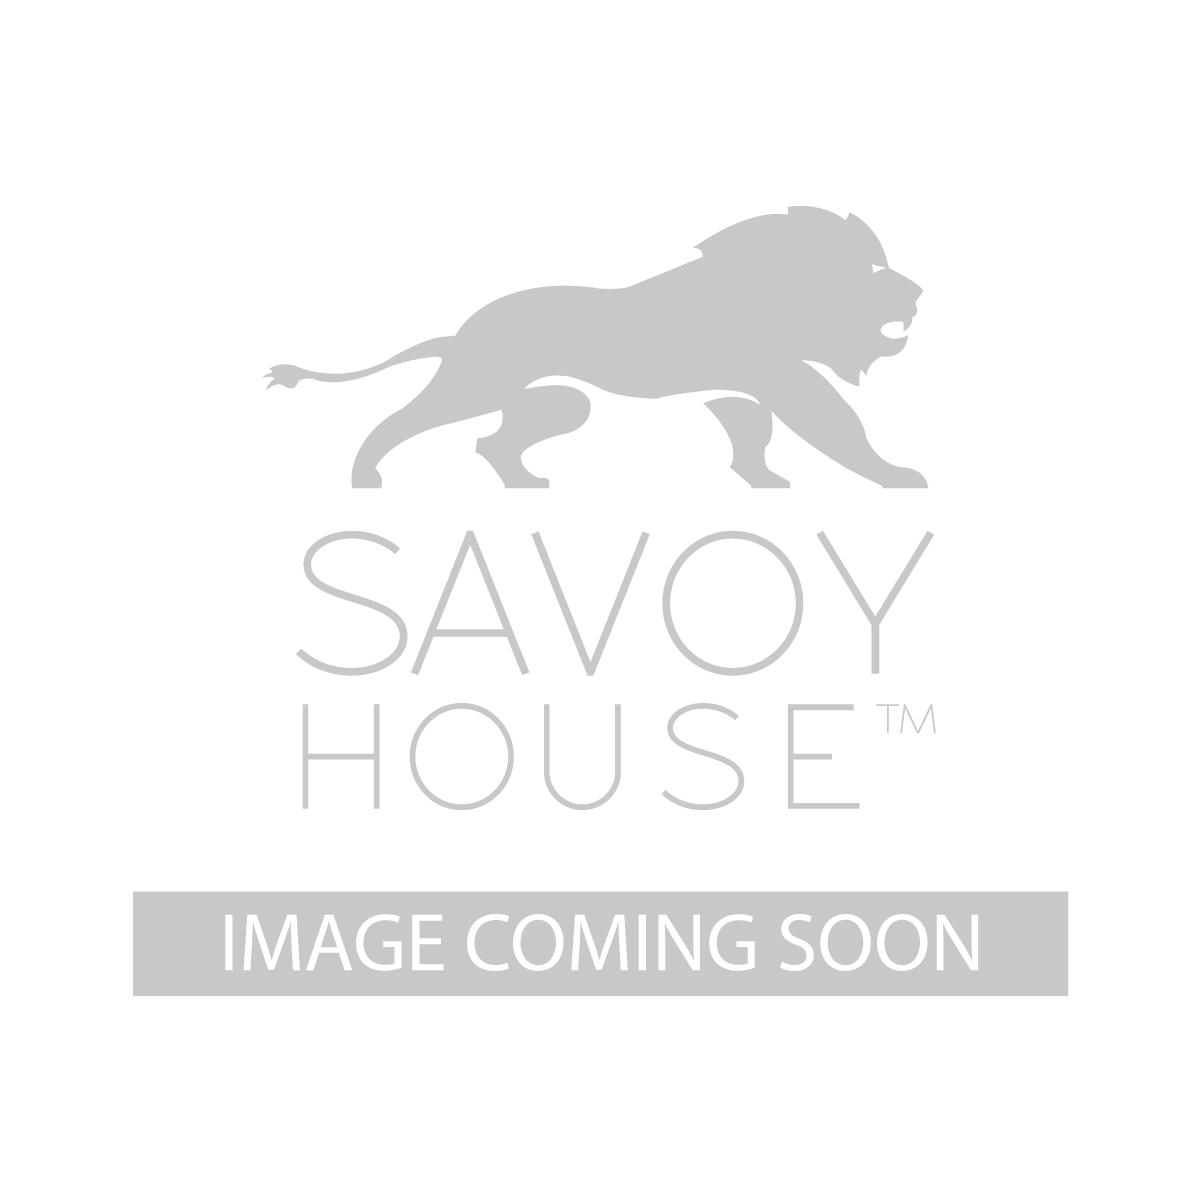 5 2505 306 Ponce De Leon Hanging Lantern By Savoy House